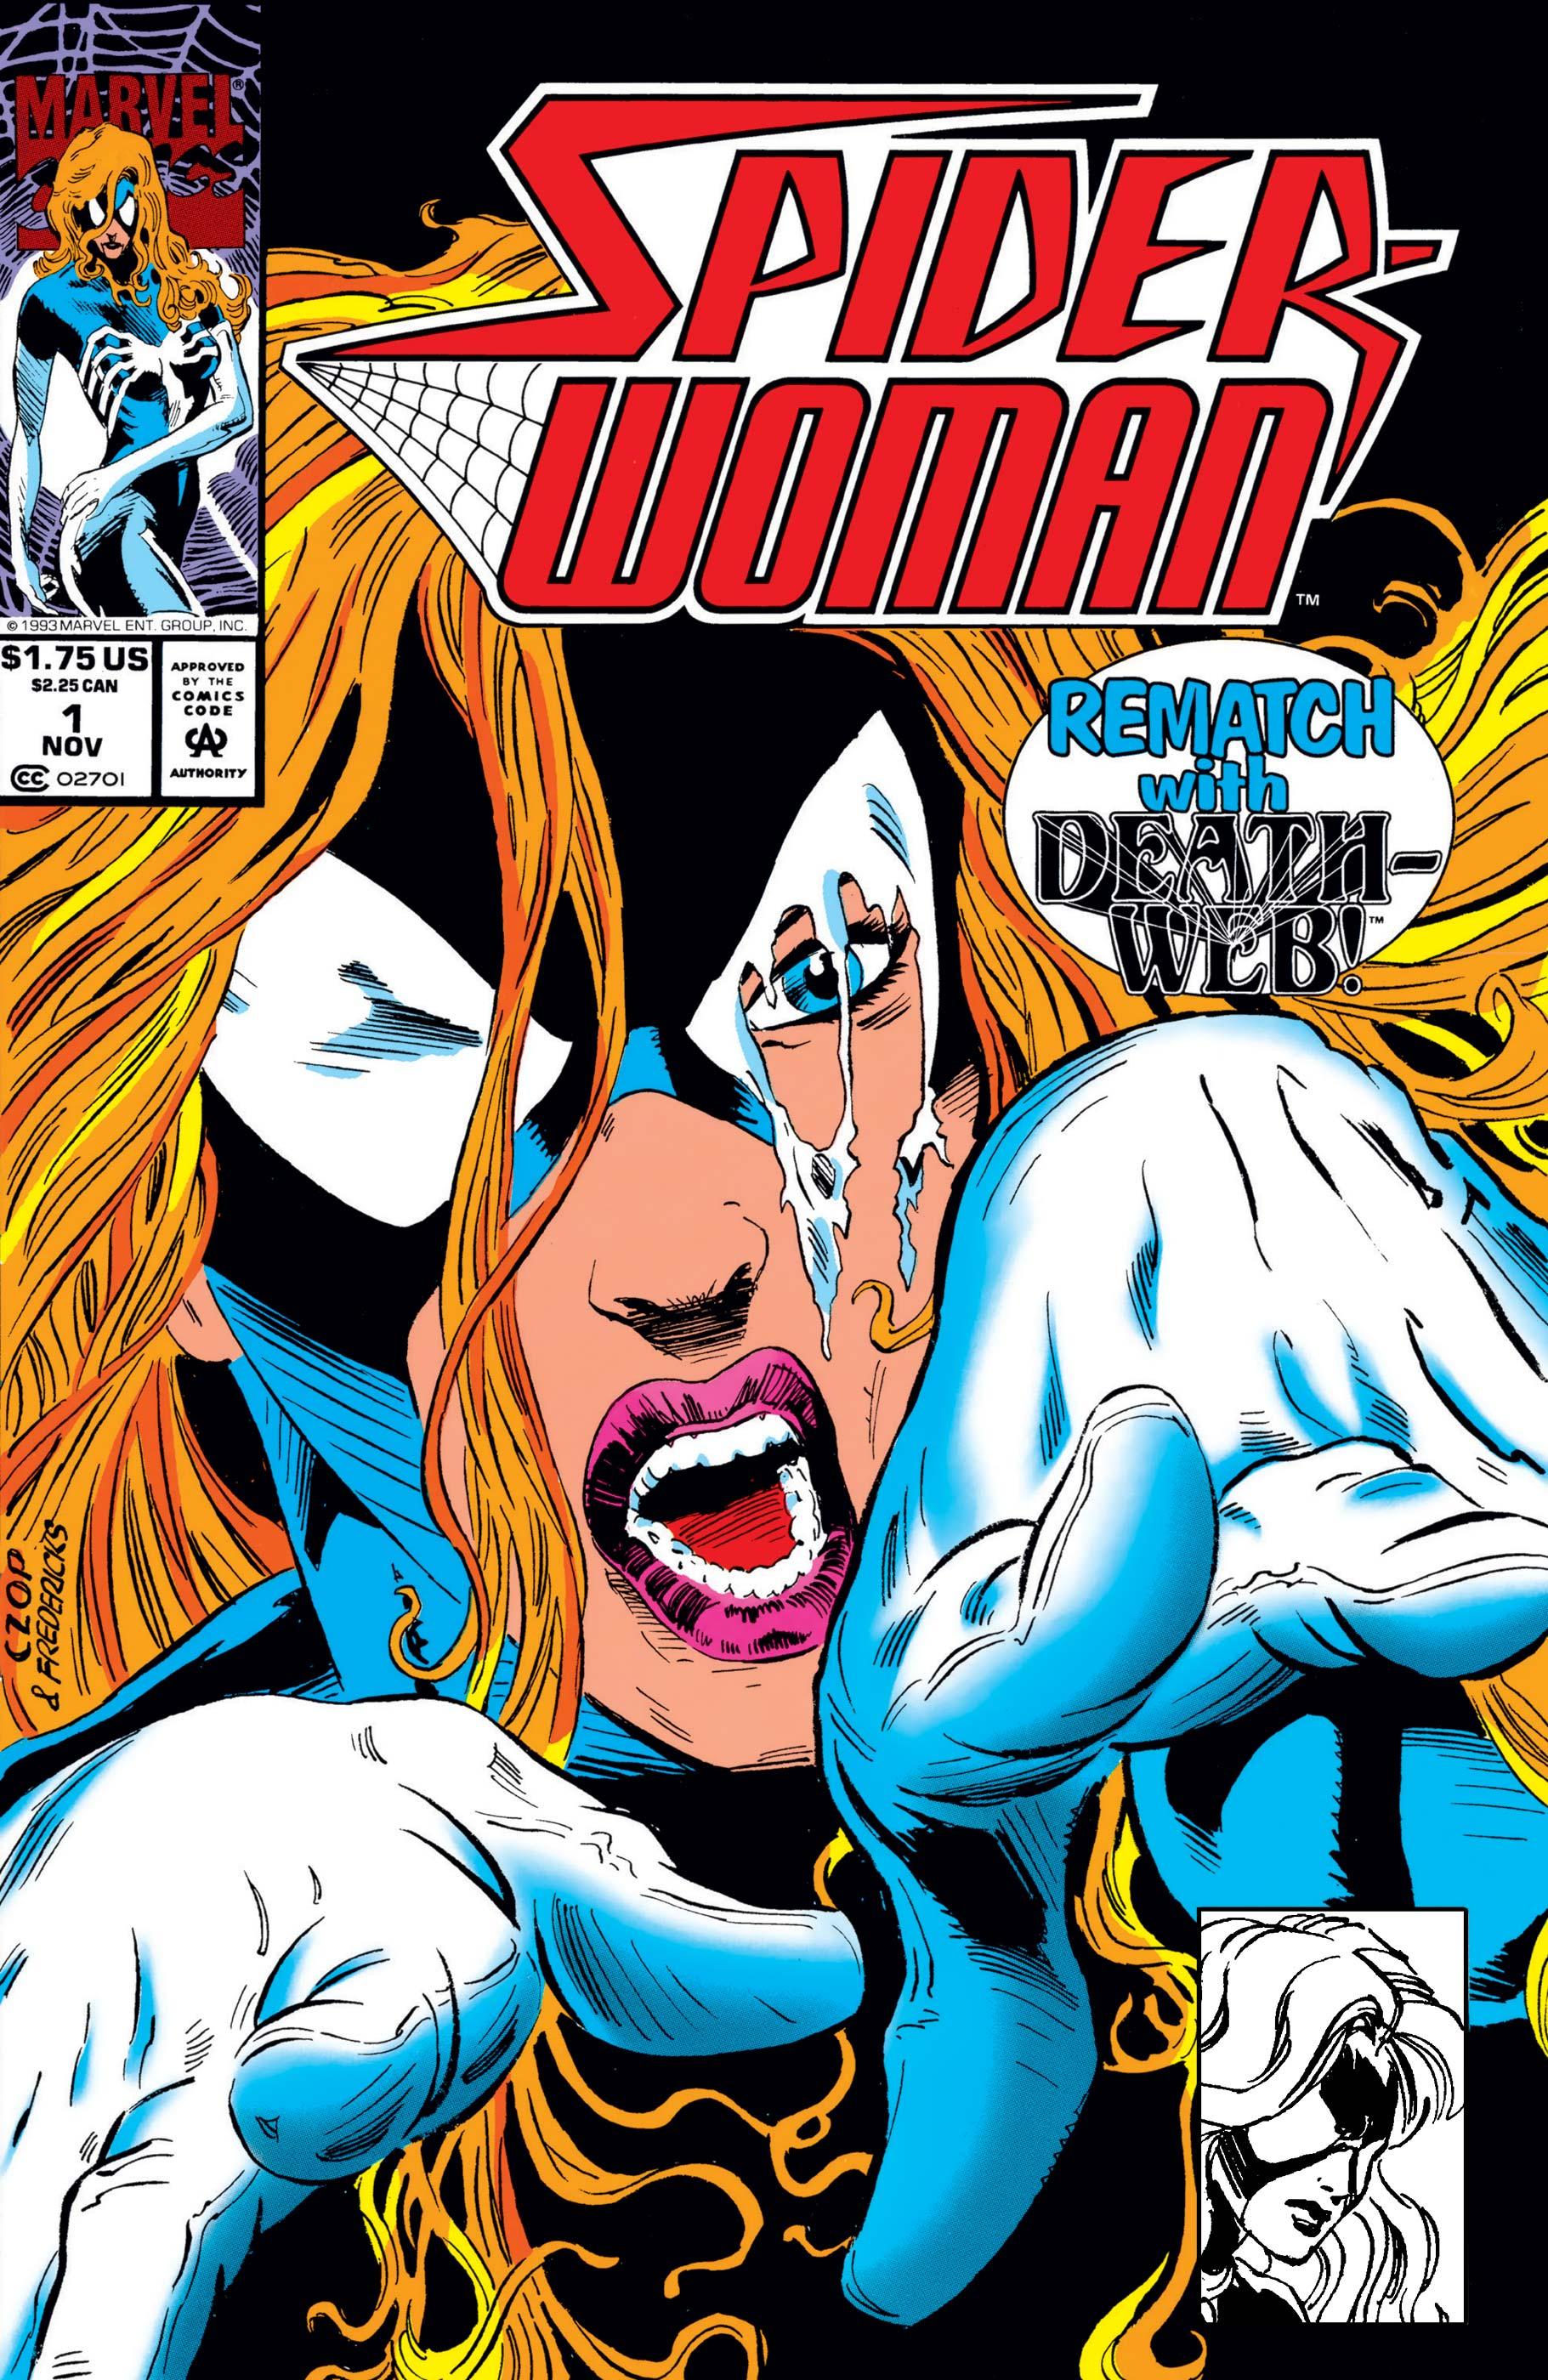 Spider-Woman (1993) #1